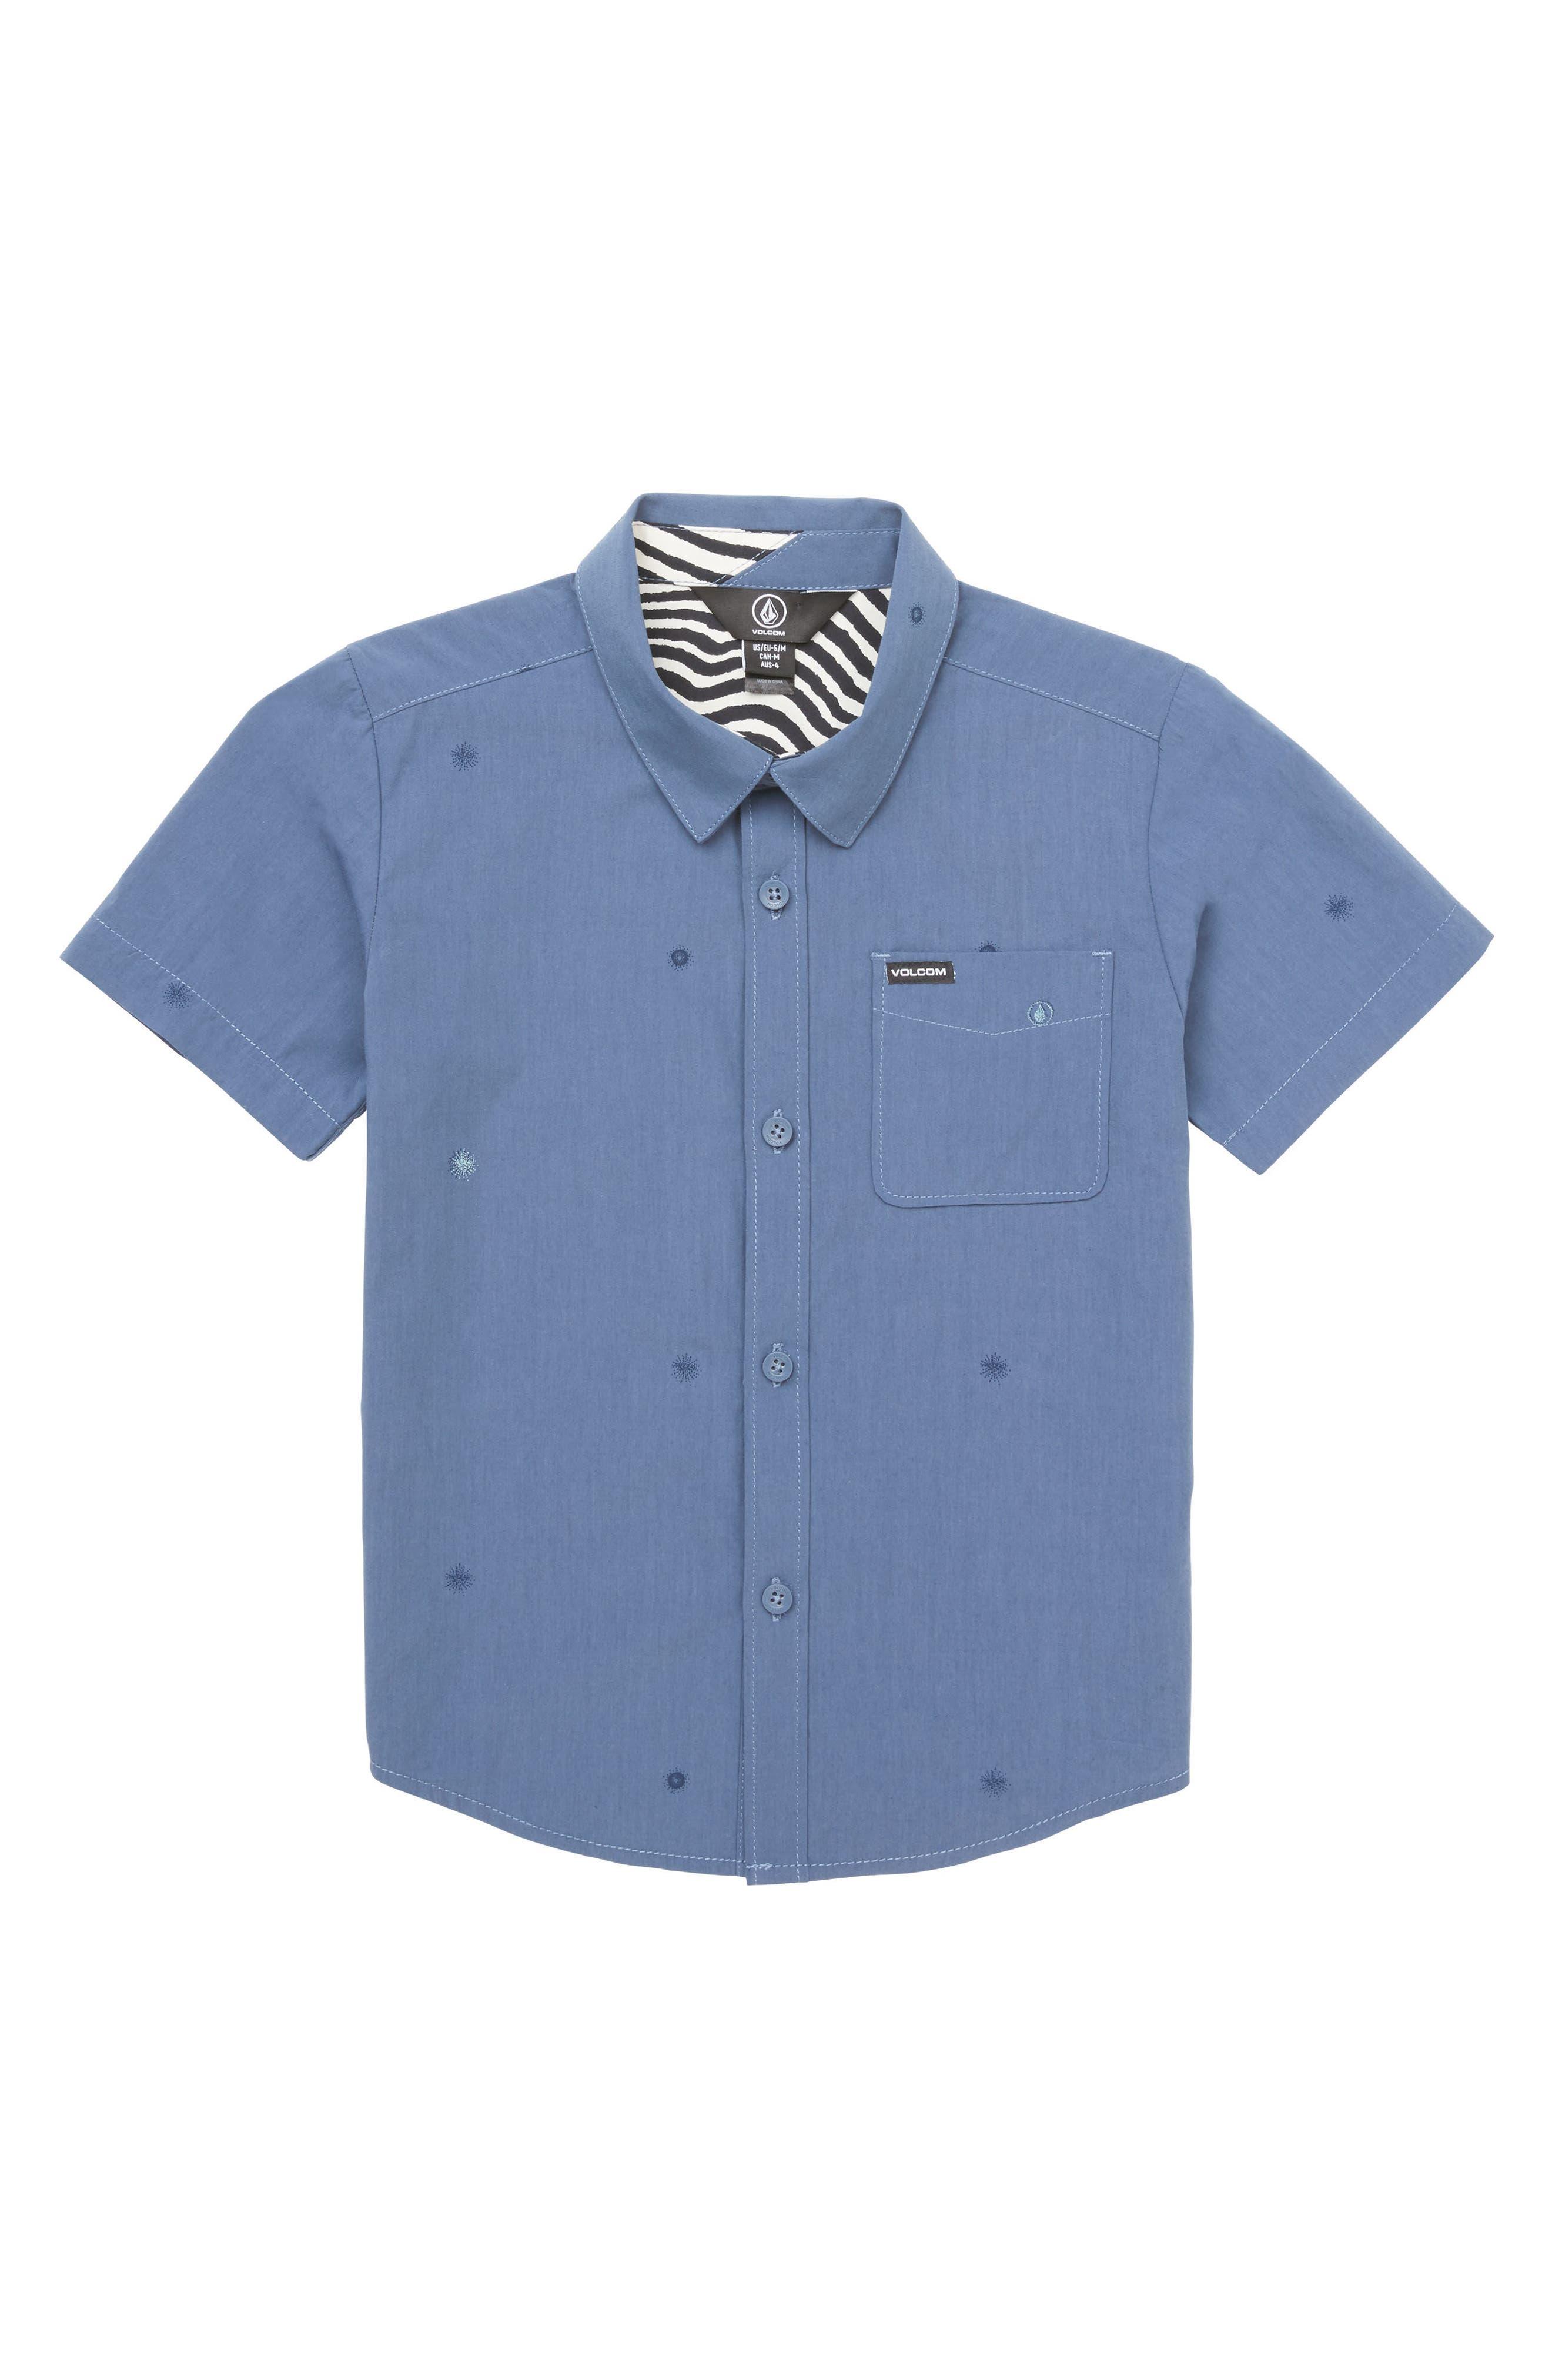 Volcom Bleeker Woven Shirt (Toddler Boys & Little Boys)